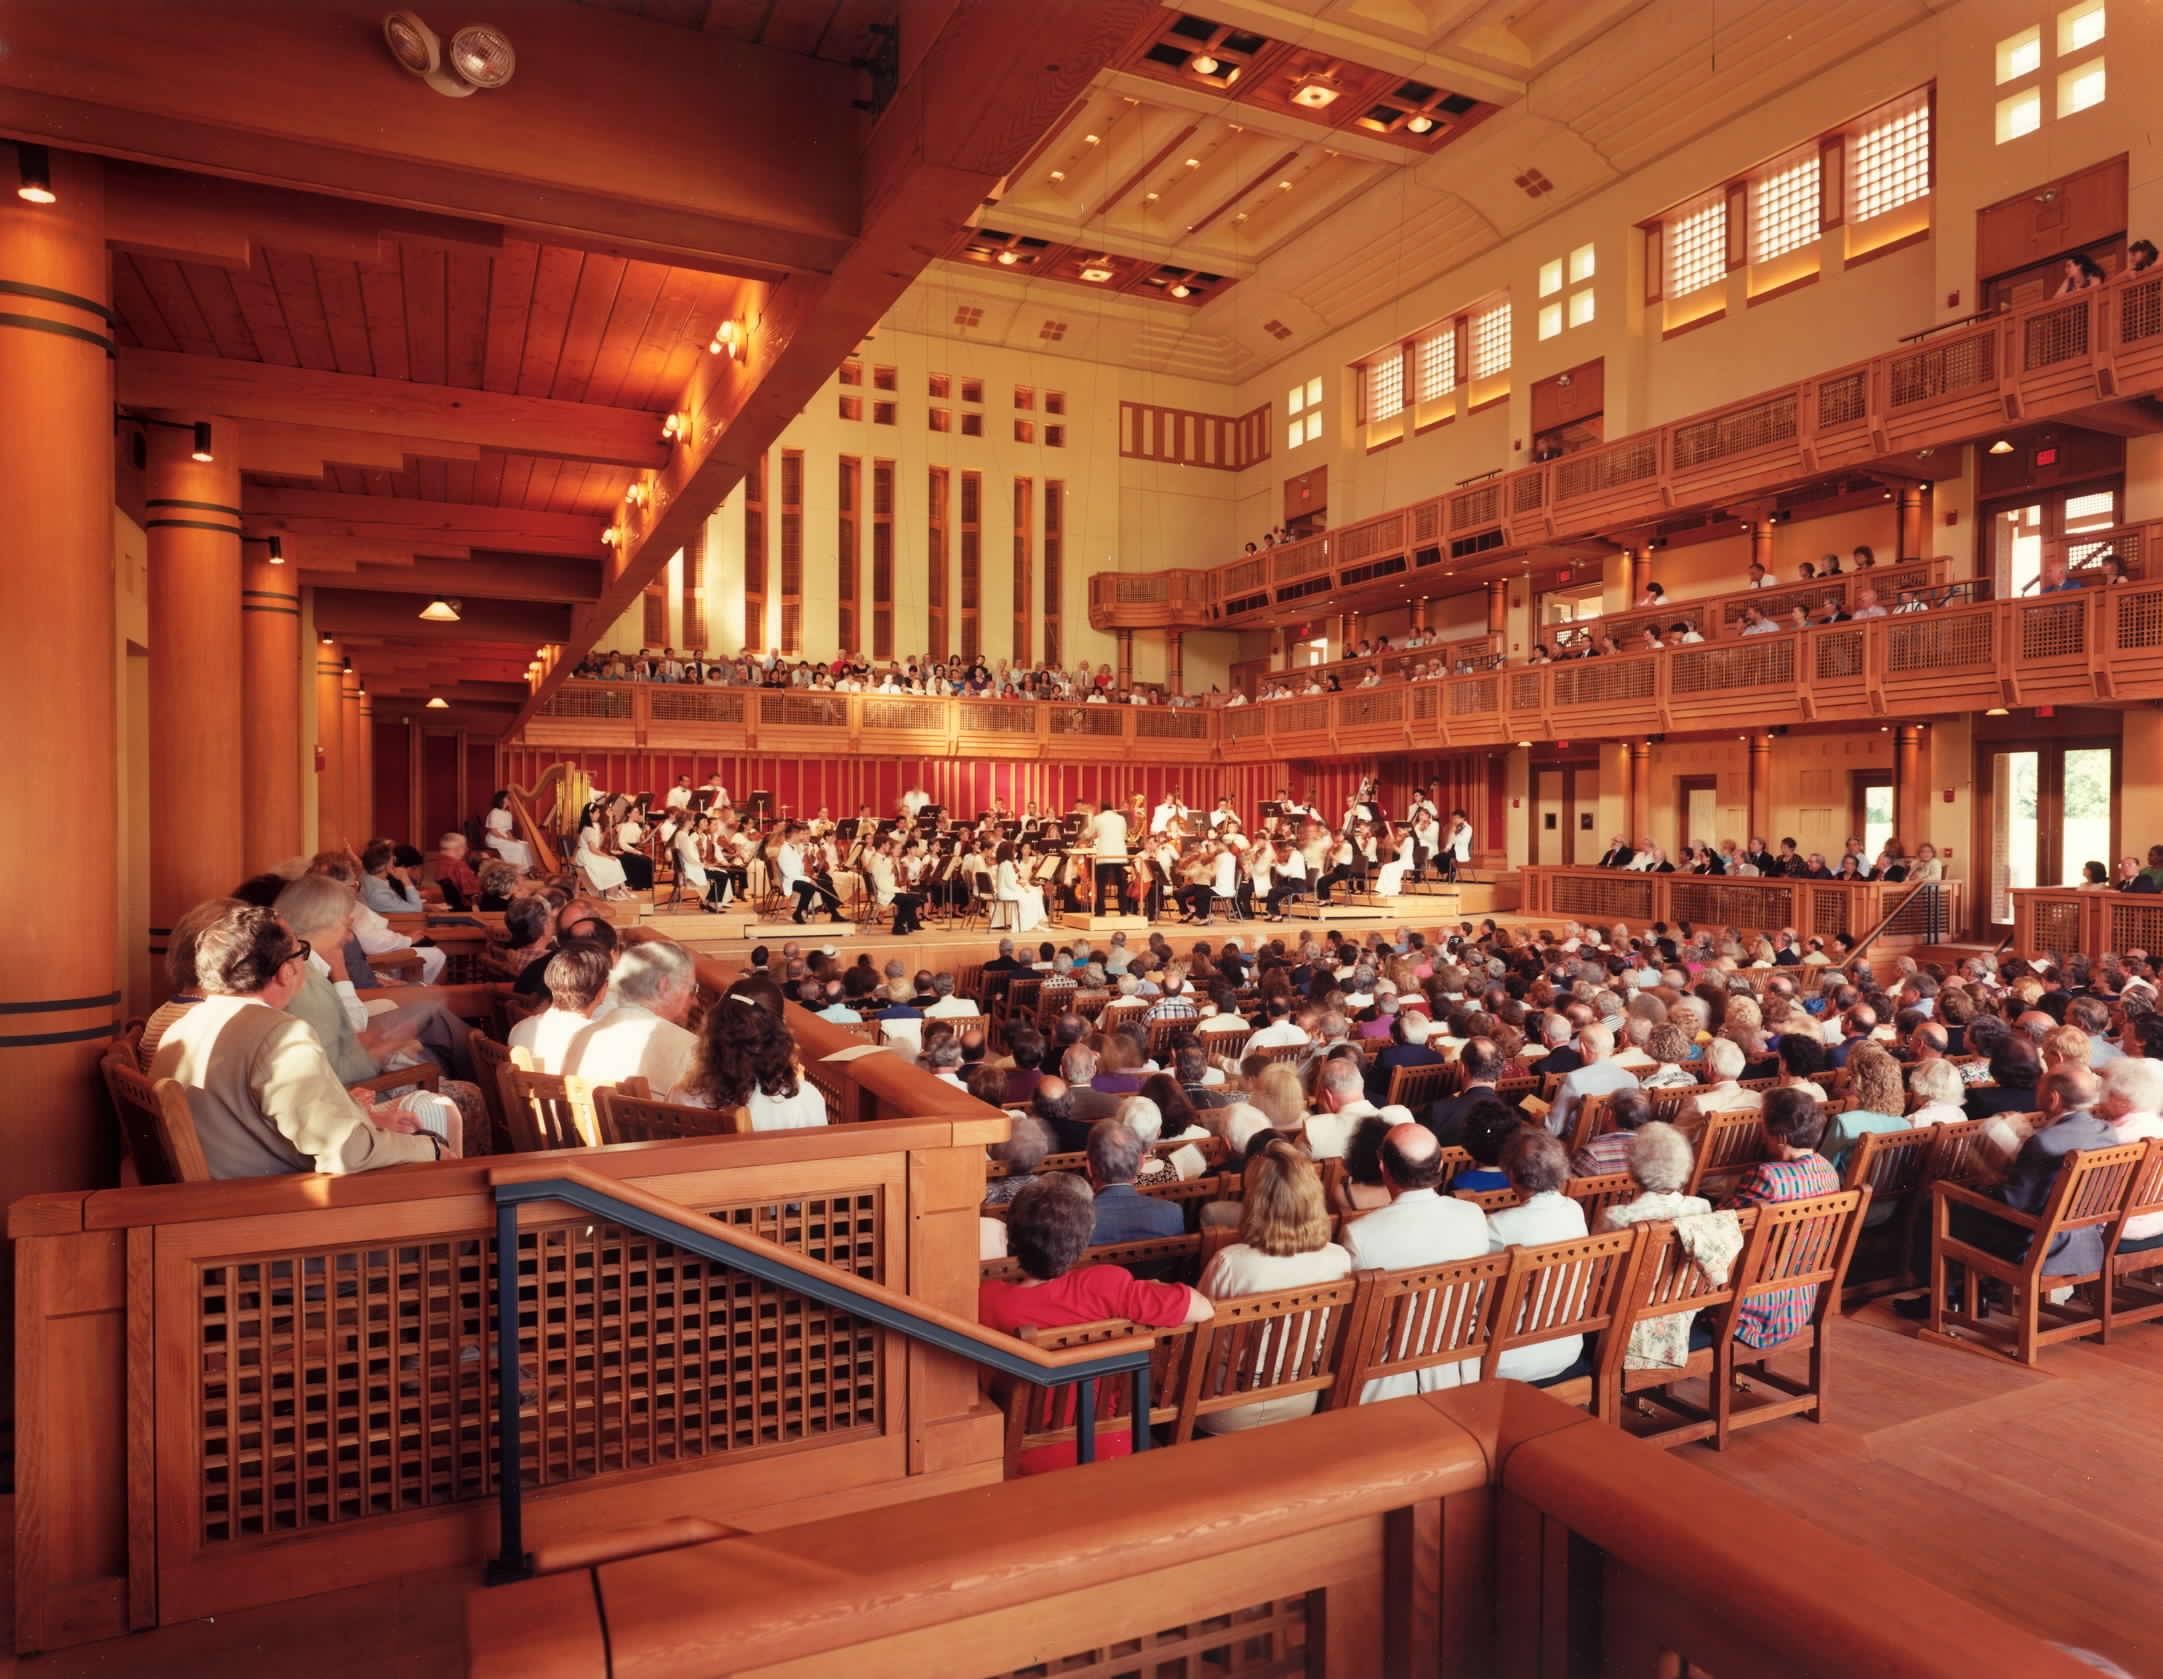 Tanglewood-Ozawa-Hall-Alan-Joslin-06.jpg